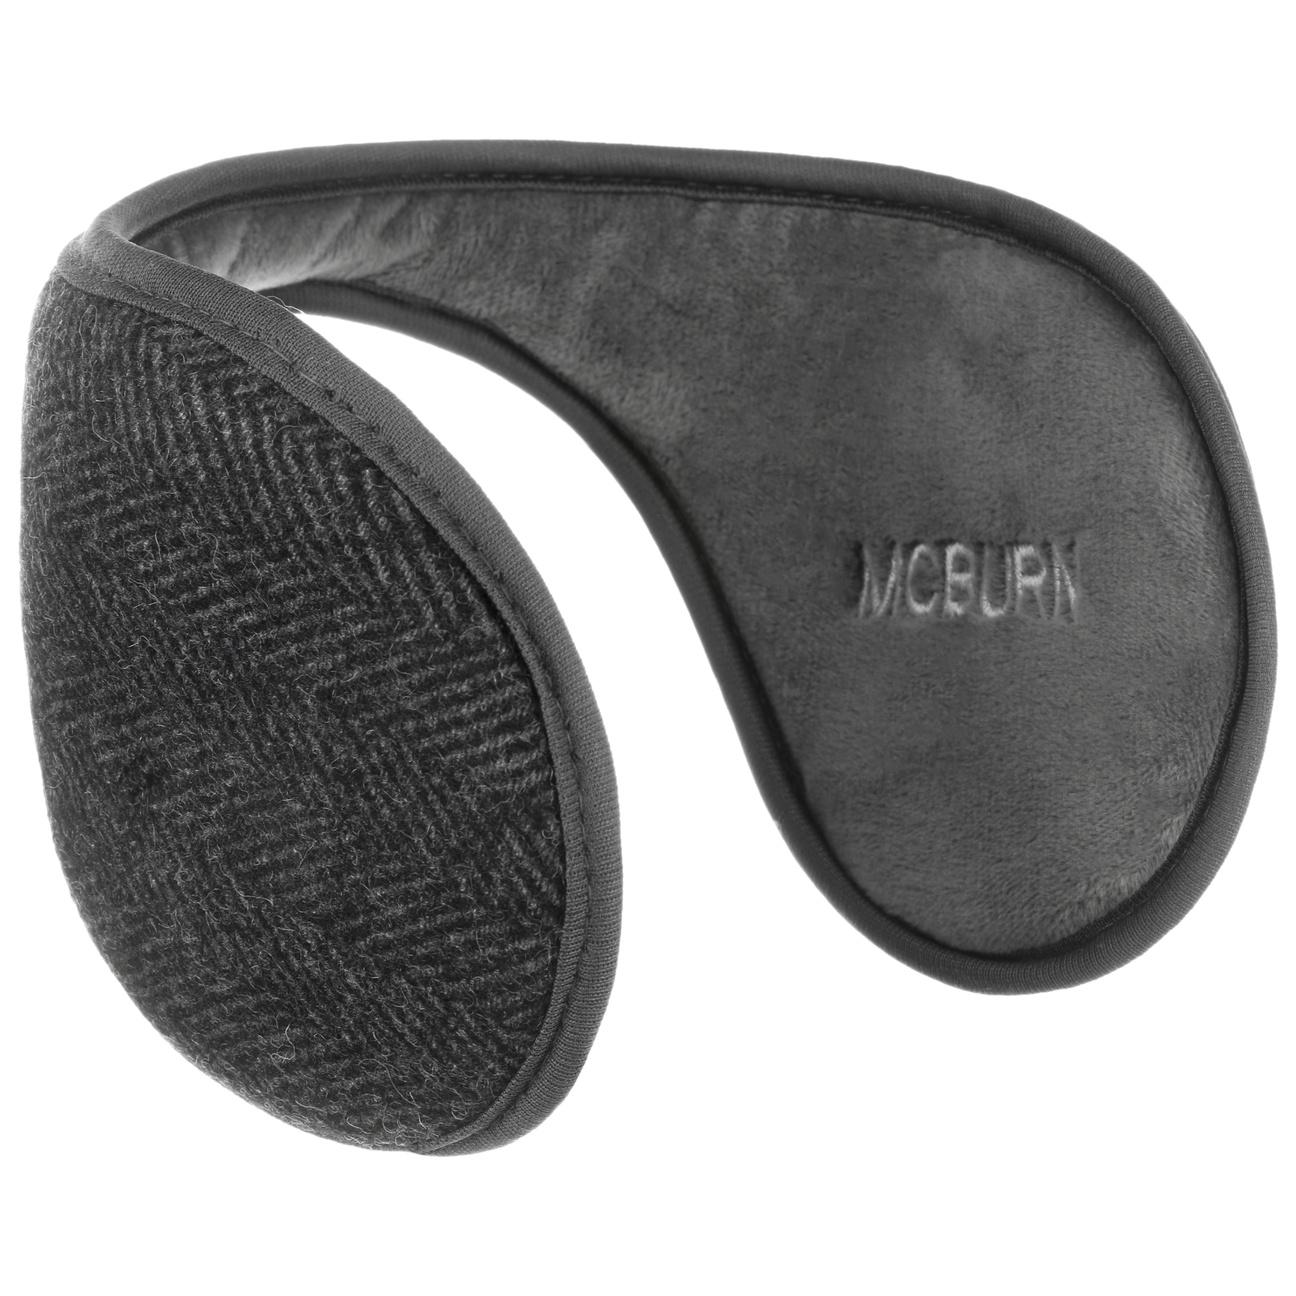 Oreillettes Herringbone by McBURN  cache-oreilles